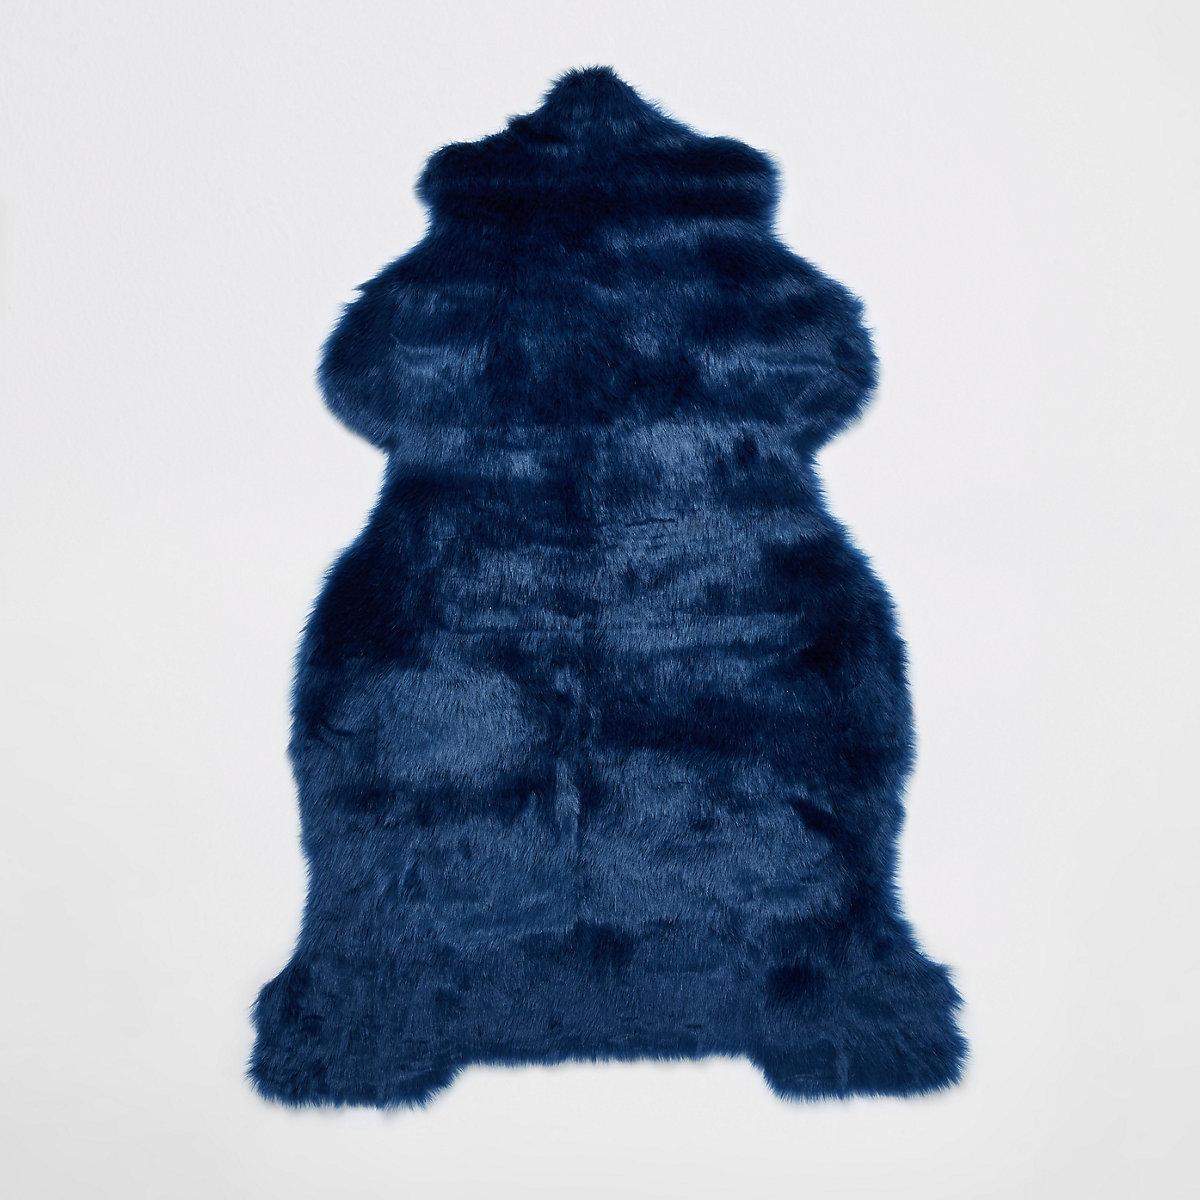 Blue faux fur rug with gold foil reverse